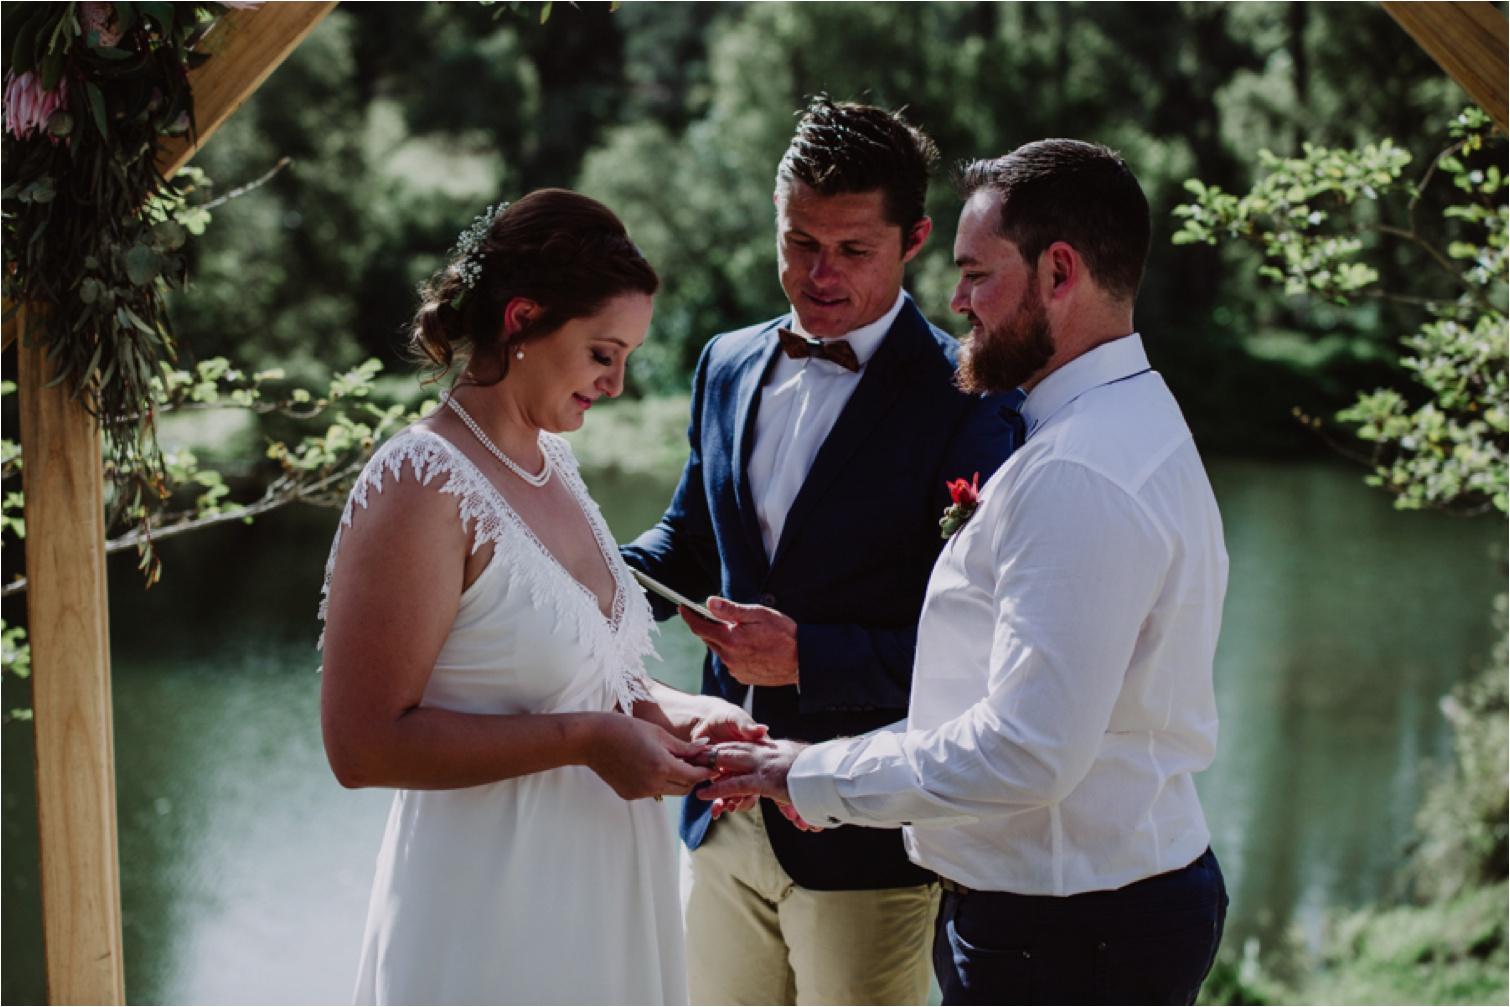 Gold Coast Wedding Photography - Riverwood Wedding_0039.jpg